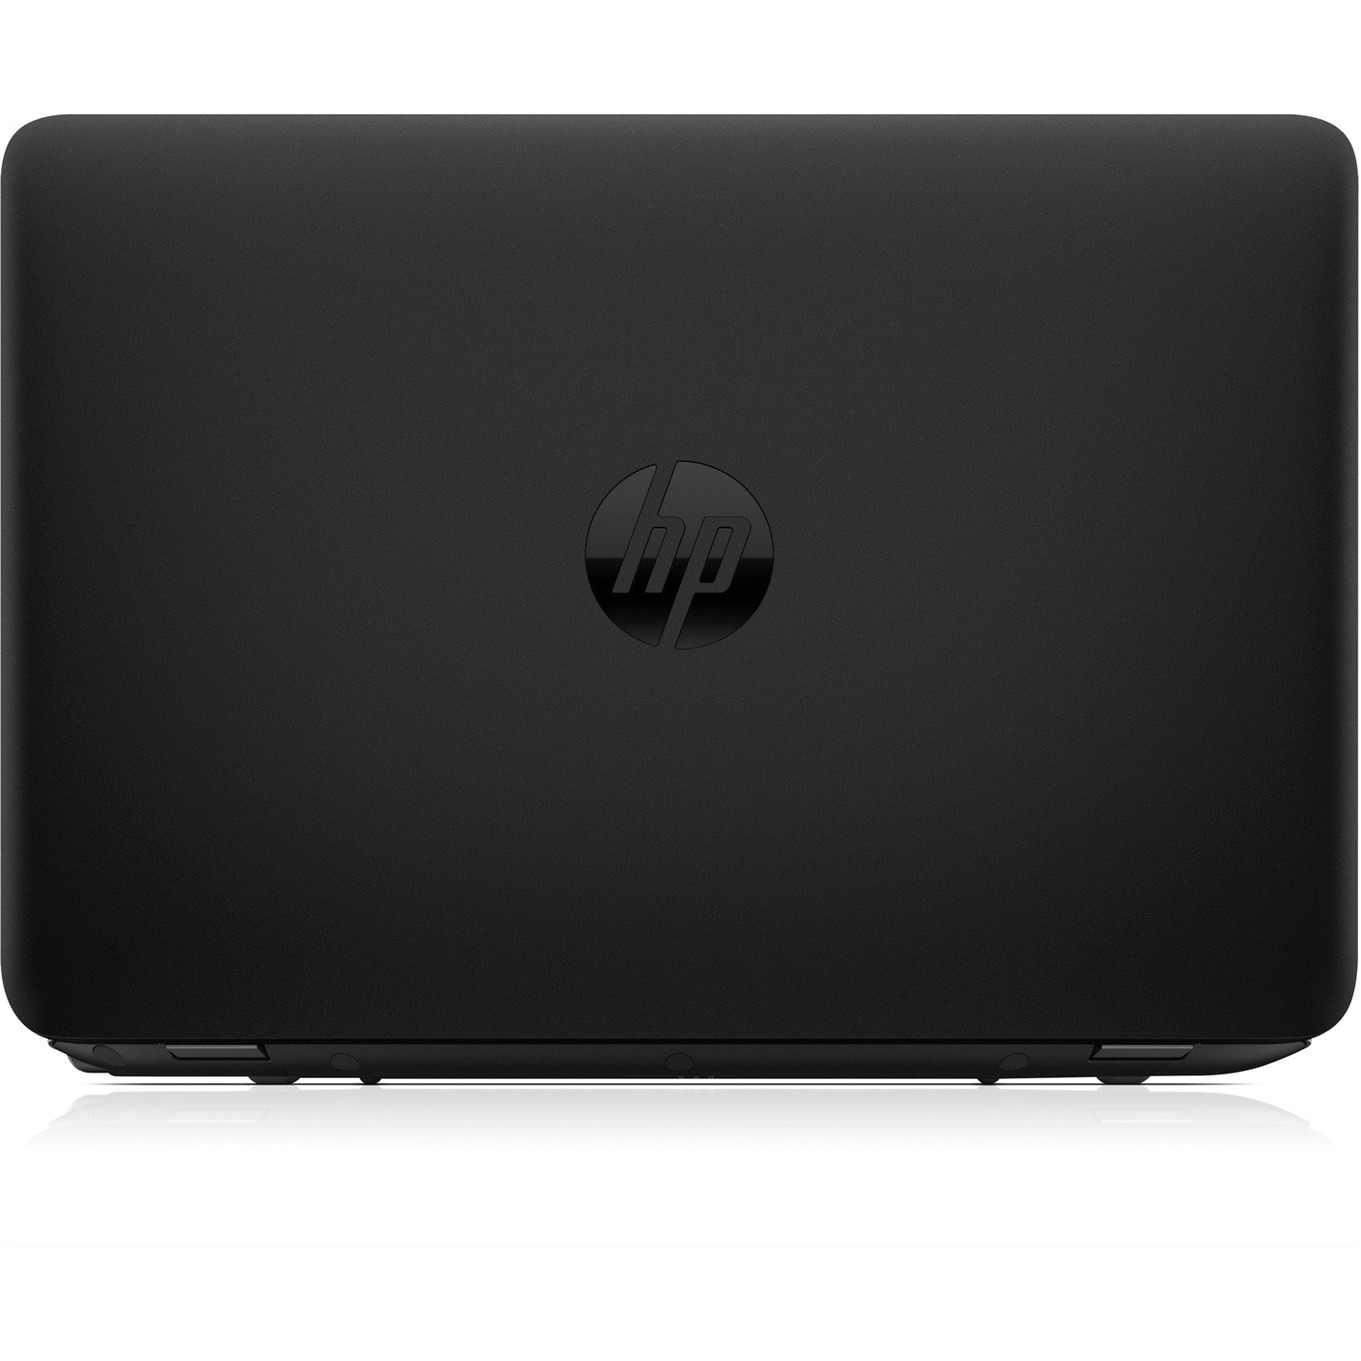 HP EliteBook 820 G2 31.8 cm 12.5inch LED Notebook - Intel Core i5 i5-5200U Dual-core 2 Core 2.20 GHz - 4 GB DDR3L SDRAM RAM - 500 GB HDD - Intel HD Graphics 5500 -